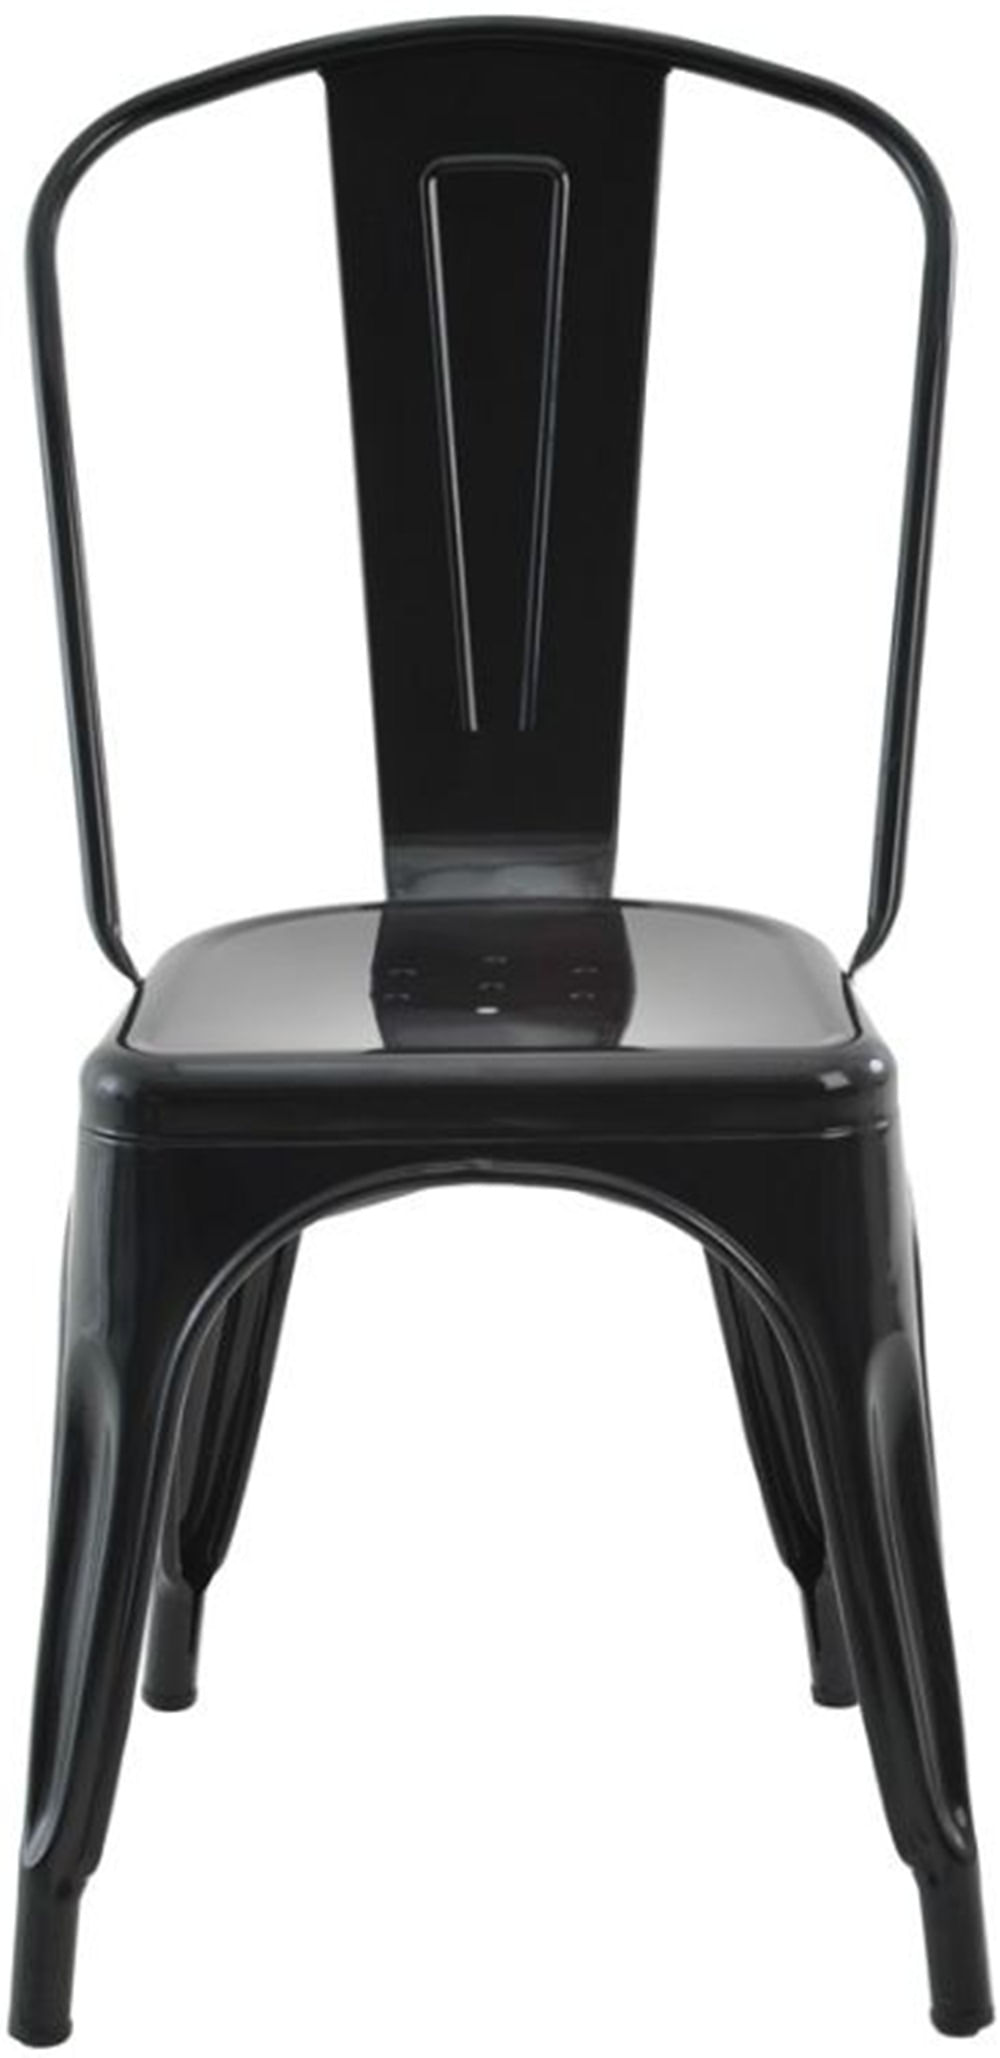 Cadeira Iron Tolix Preta - 22548